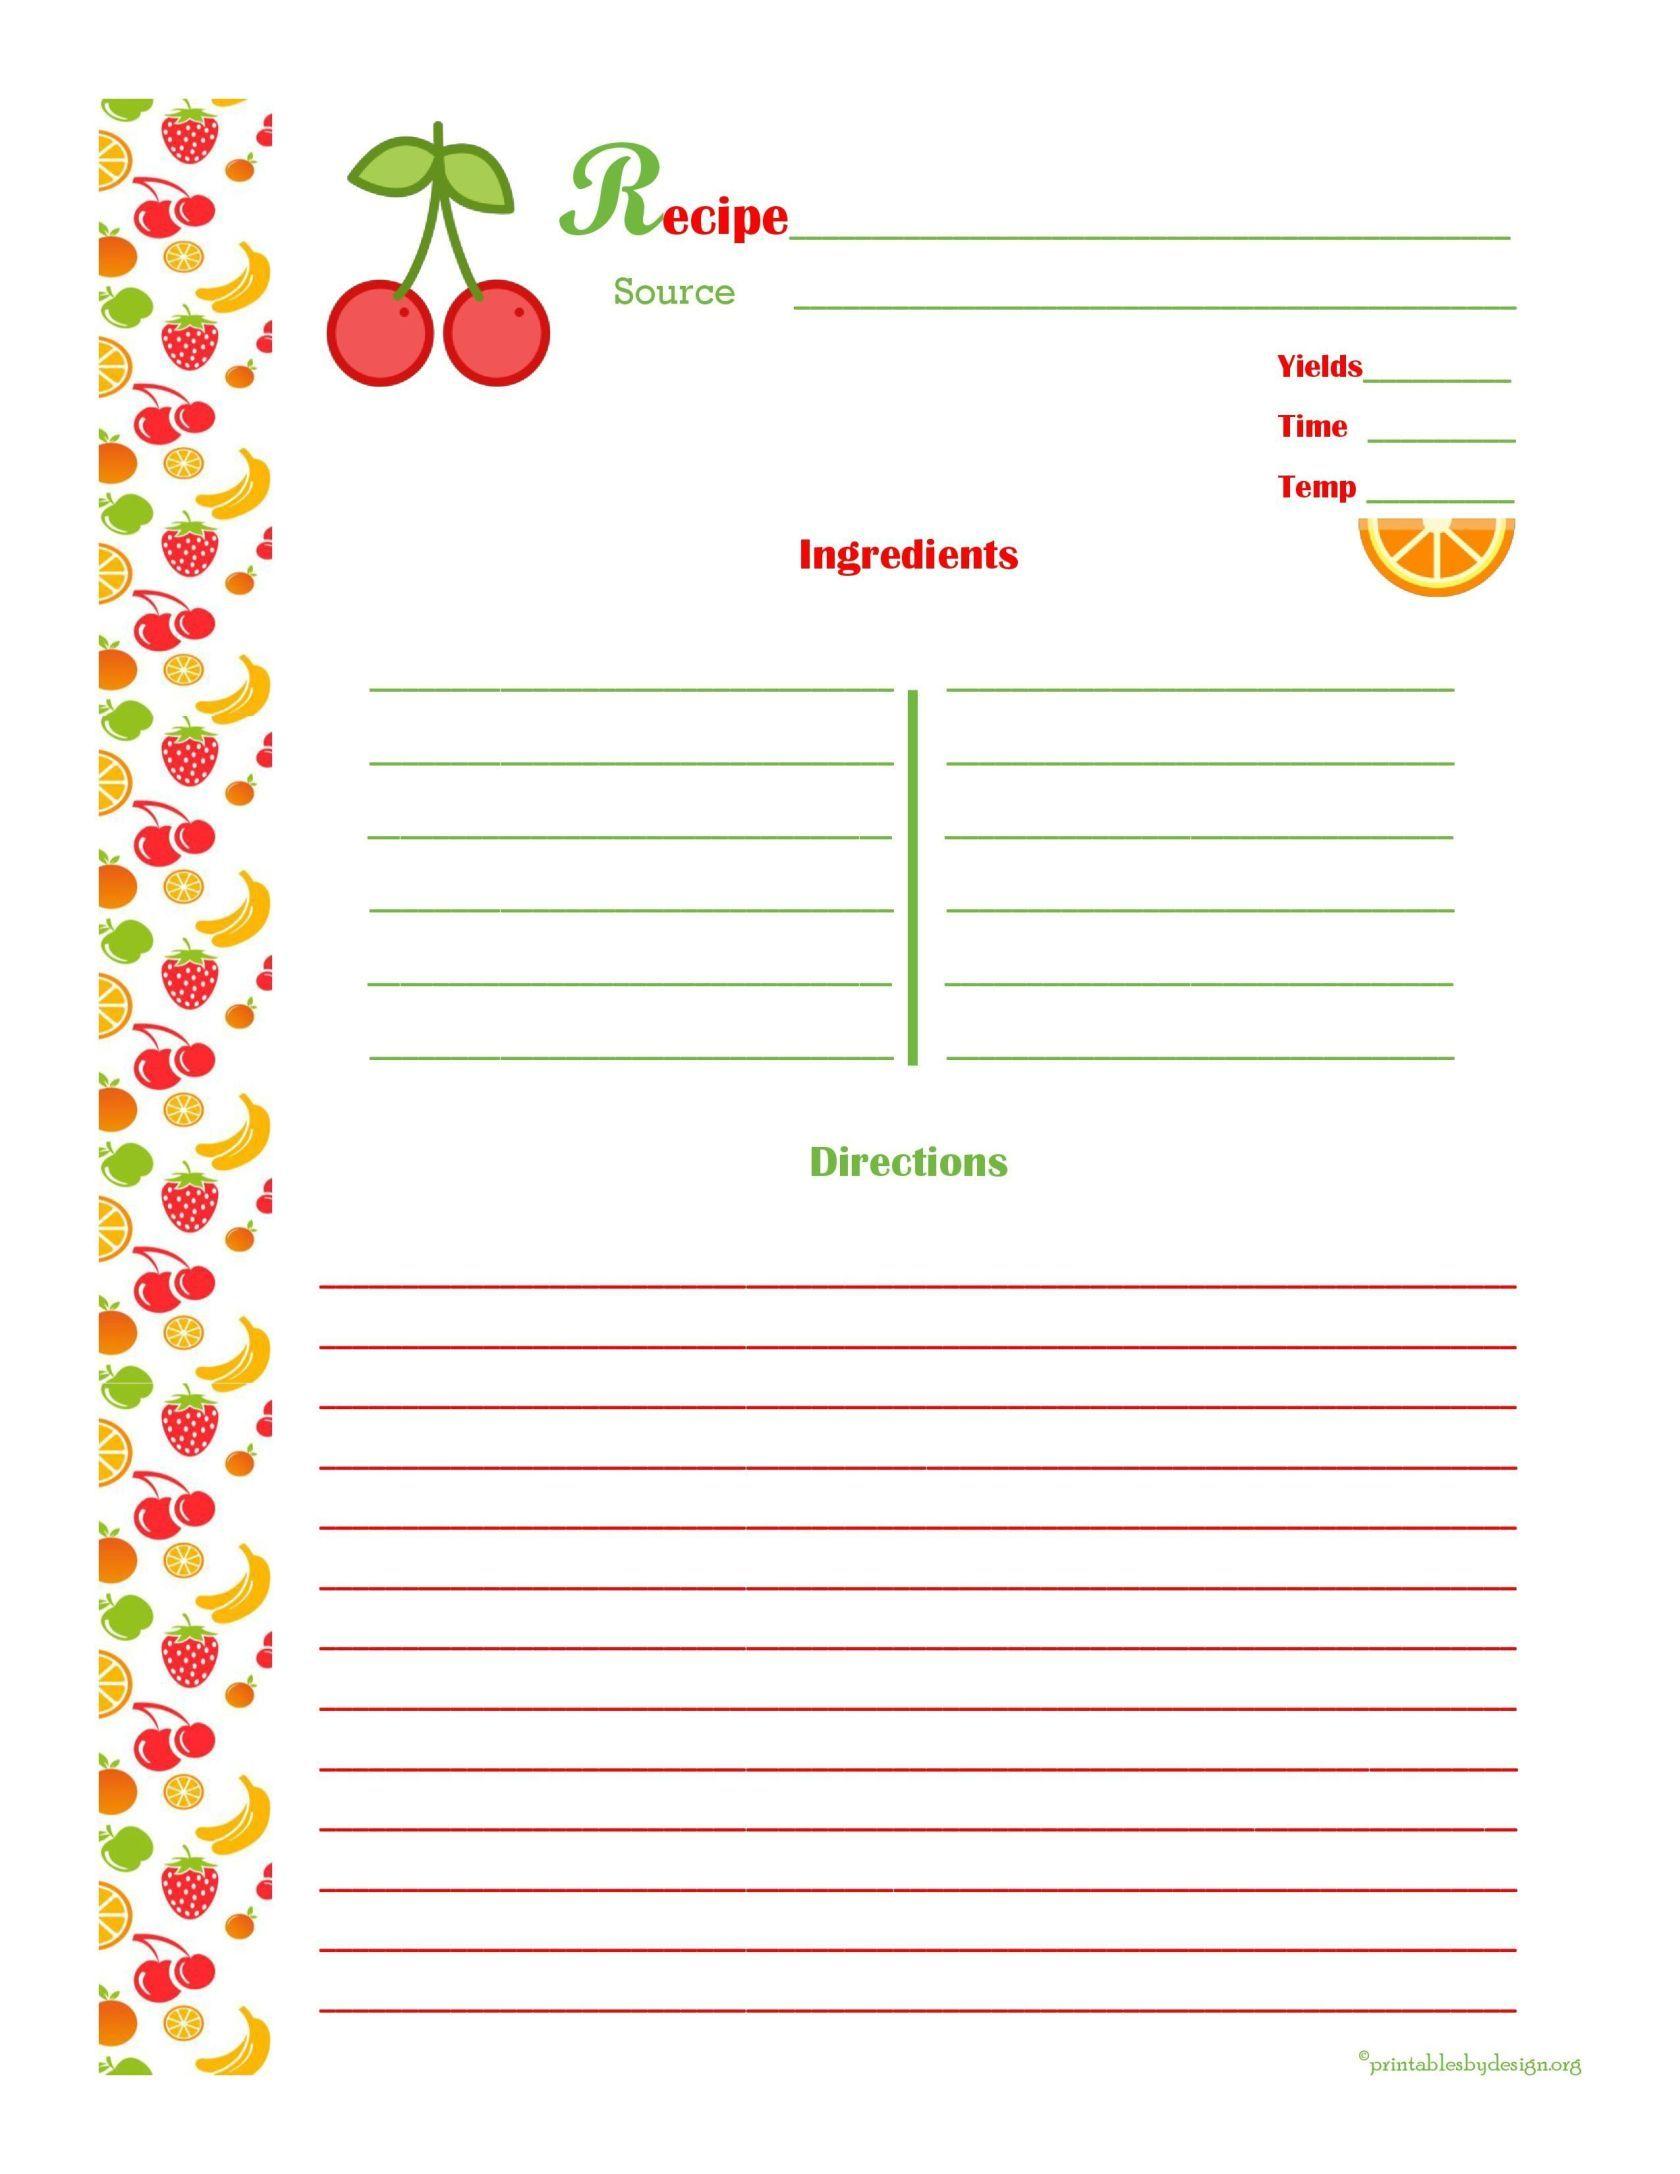 Free Editable Recipe Card Templates For Microsoft Word Free